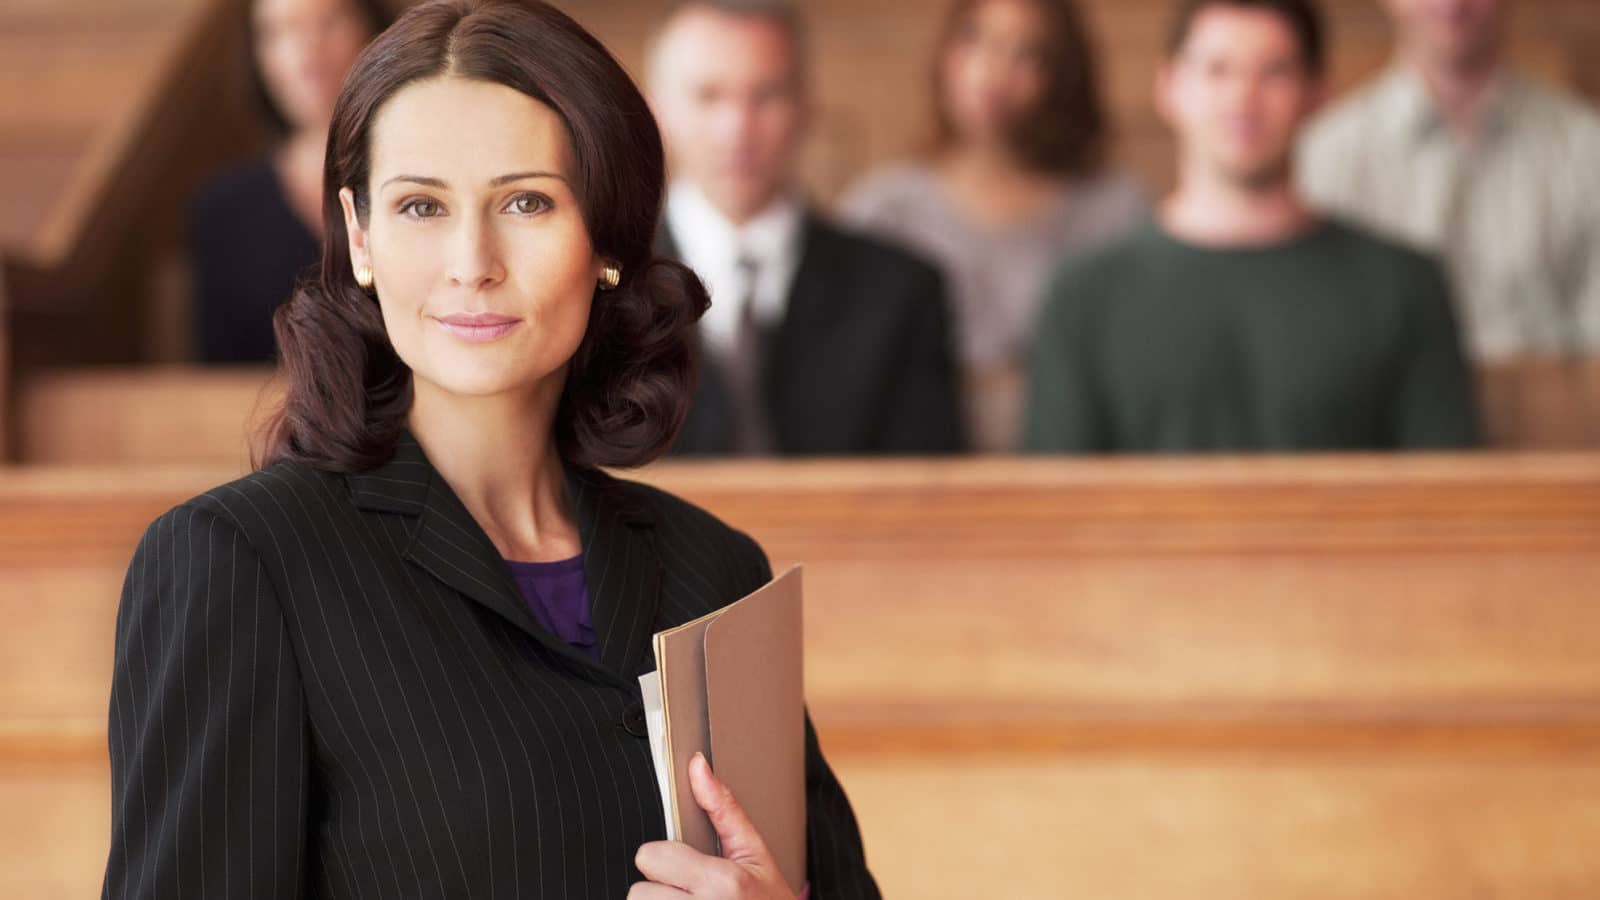 Do You Need A Good Lawyers Help Kurt Reinner